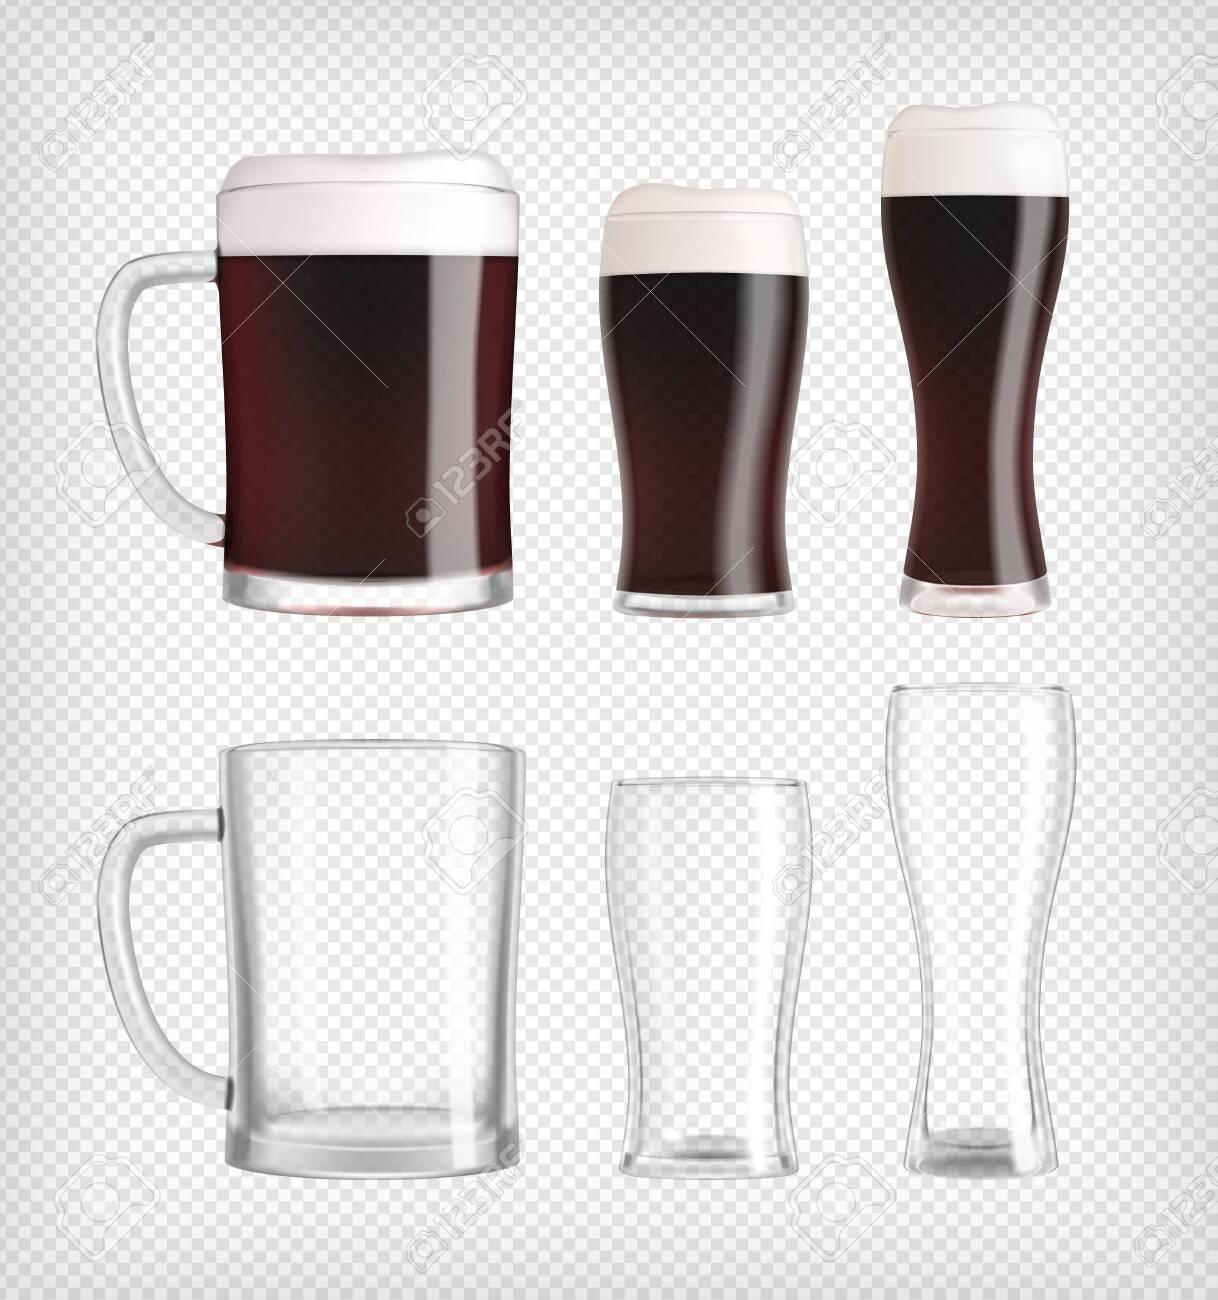 Three different dark beer glasses and mugs - 153092504